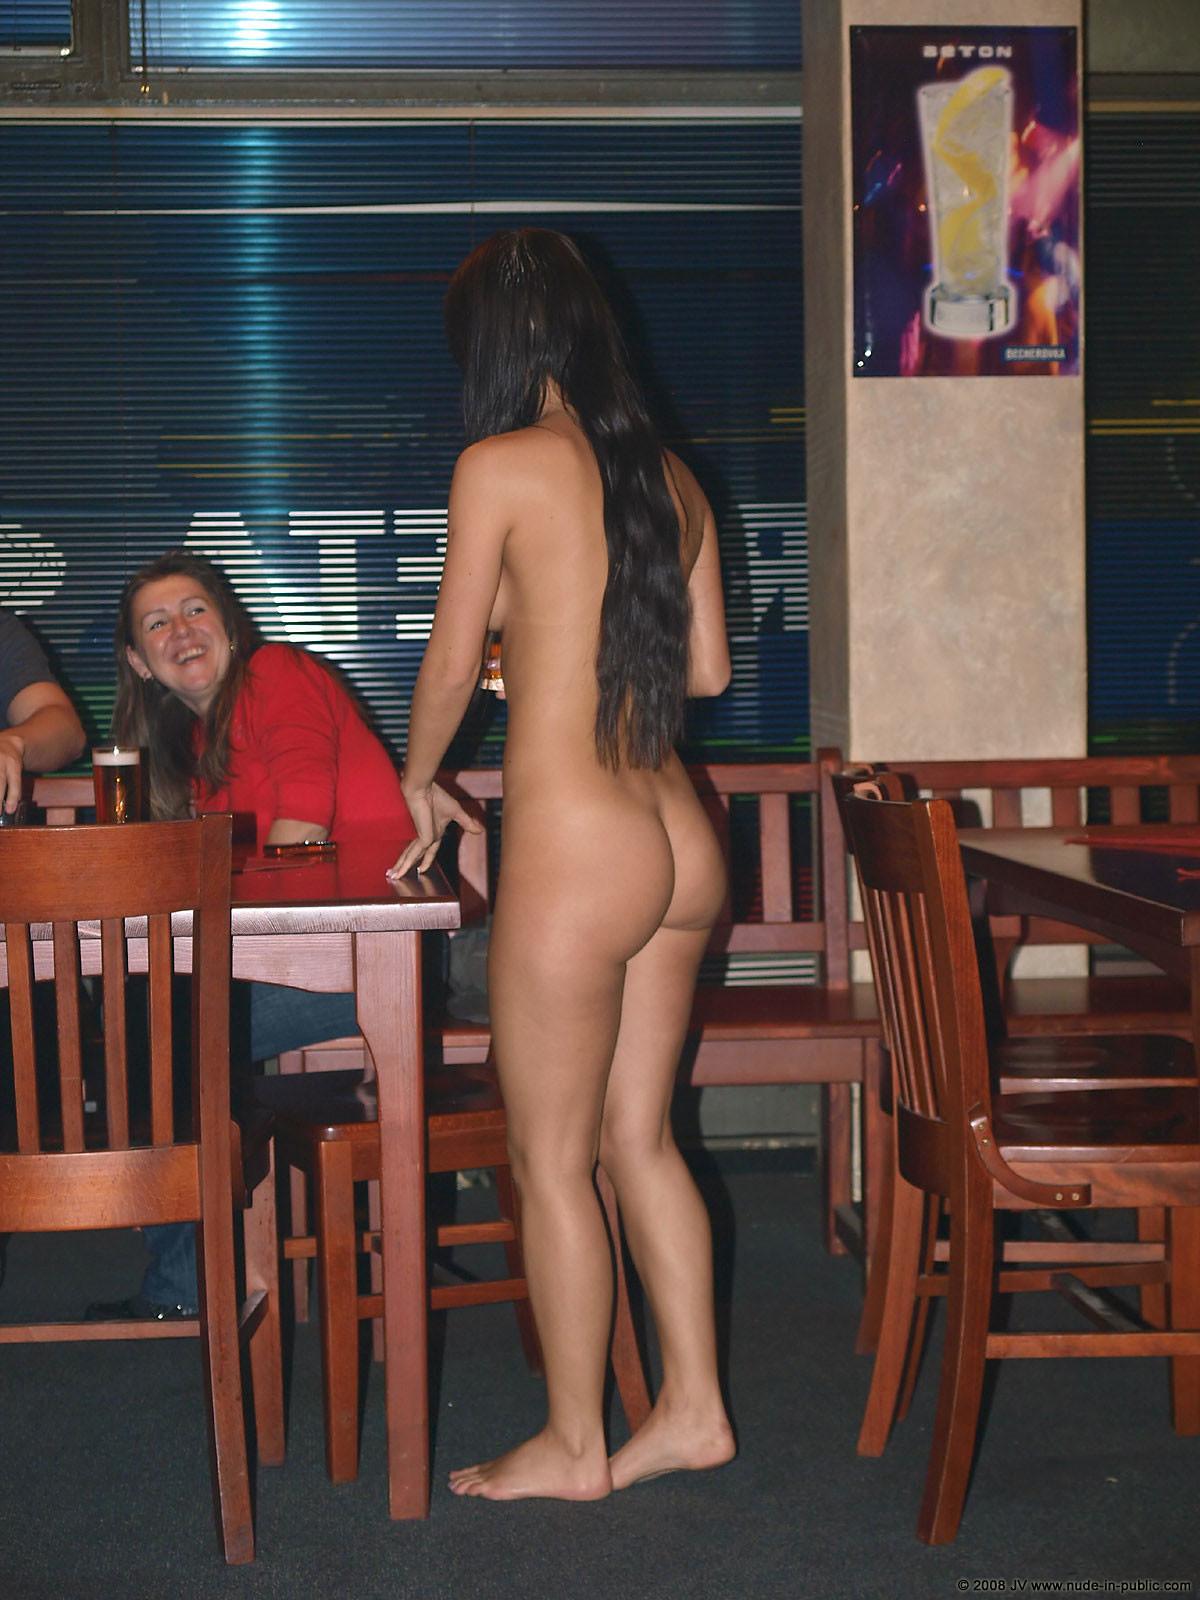 melisa-pub-beer-bar-girl-nude-in-public-58